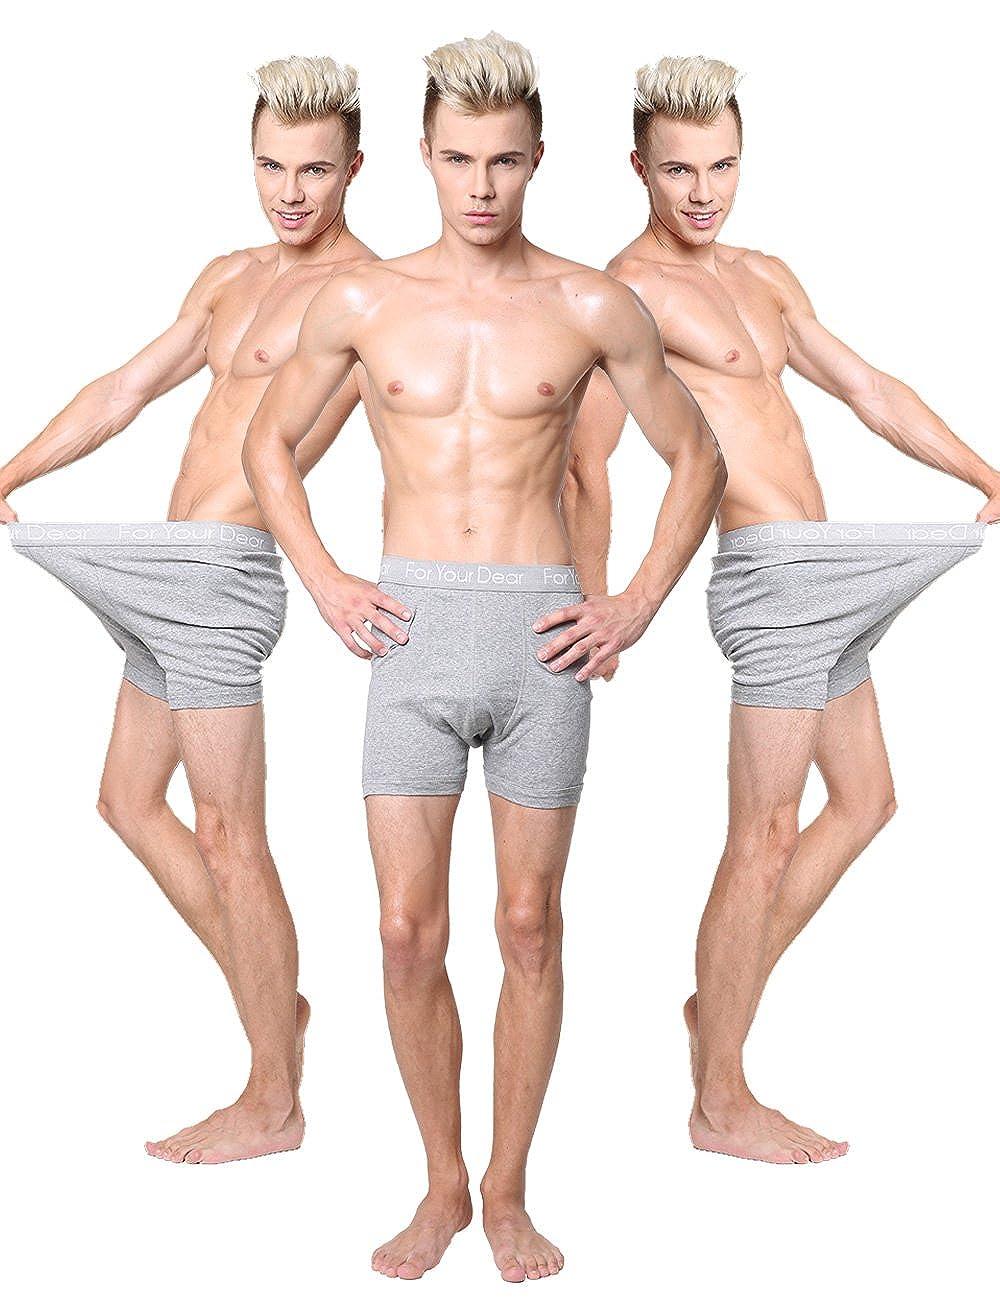 Godsen Men's 3-Pack Ultimate Boxer Briefs Underwear FYD-01-019019-3 pack